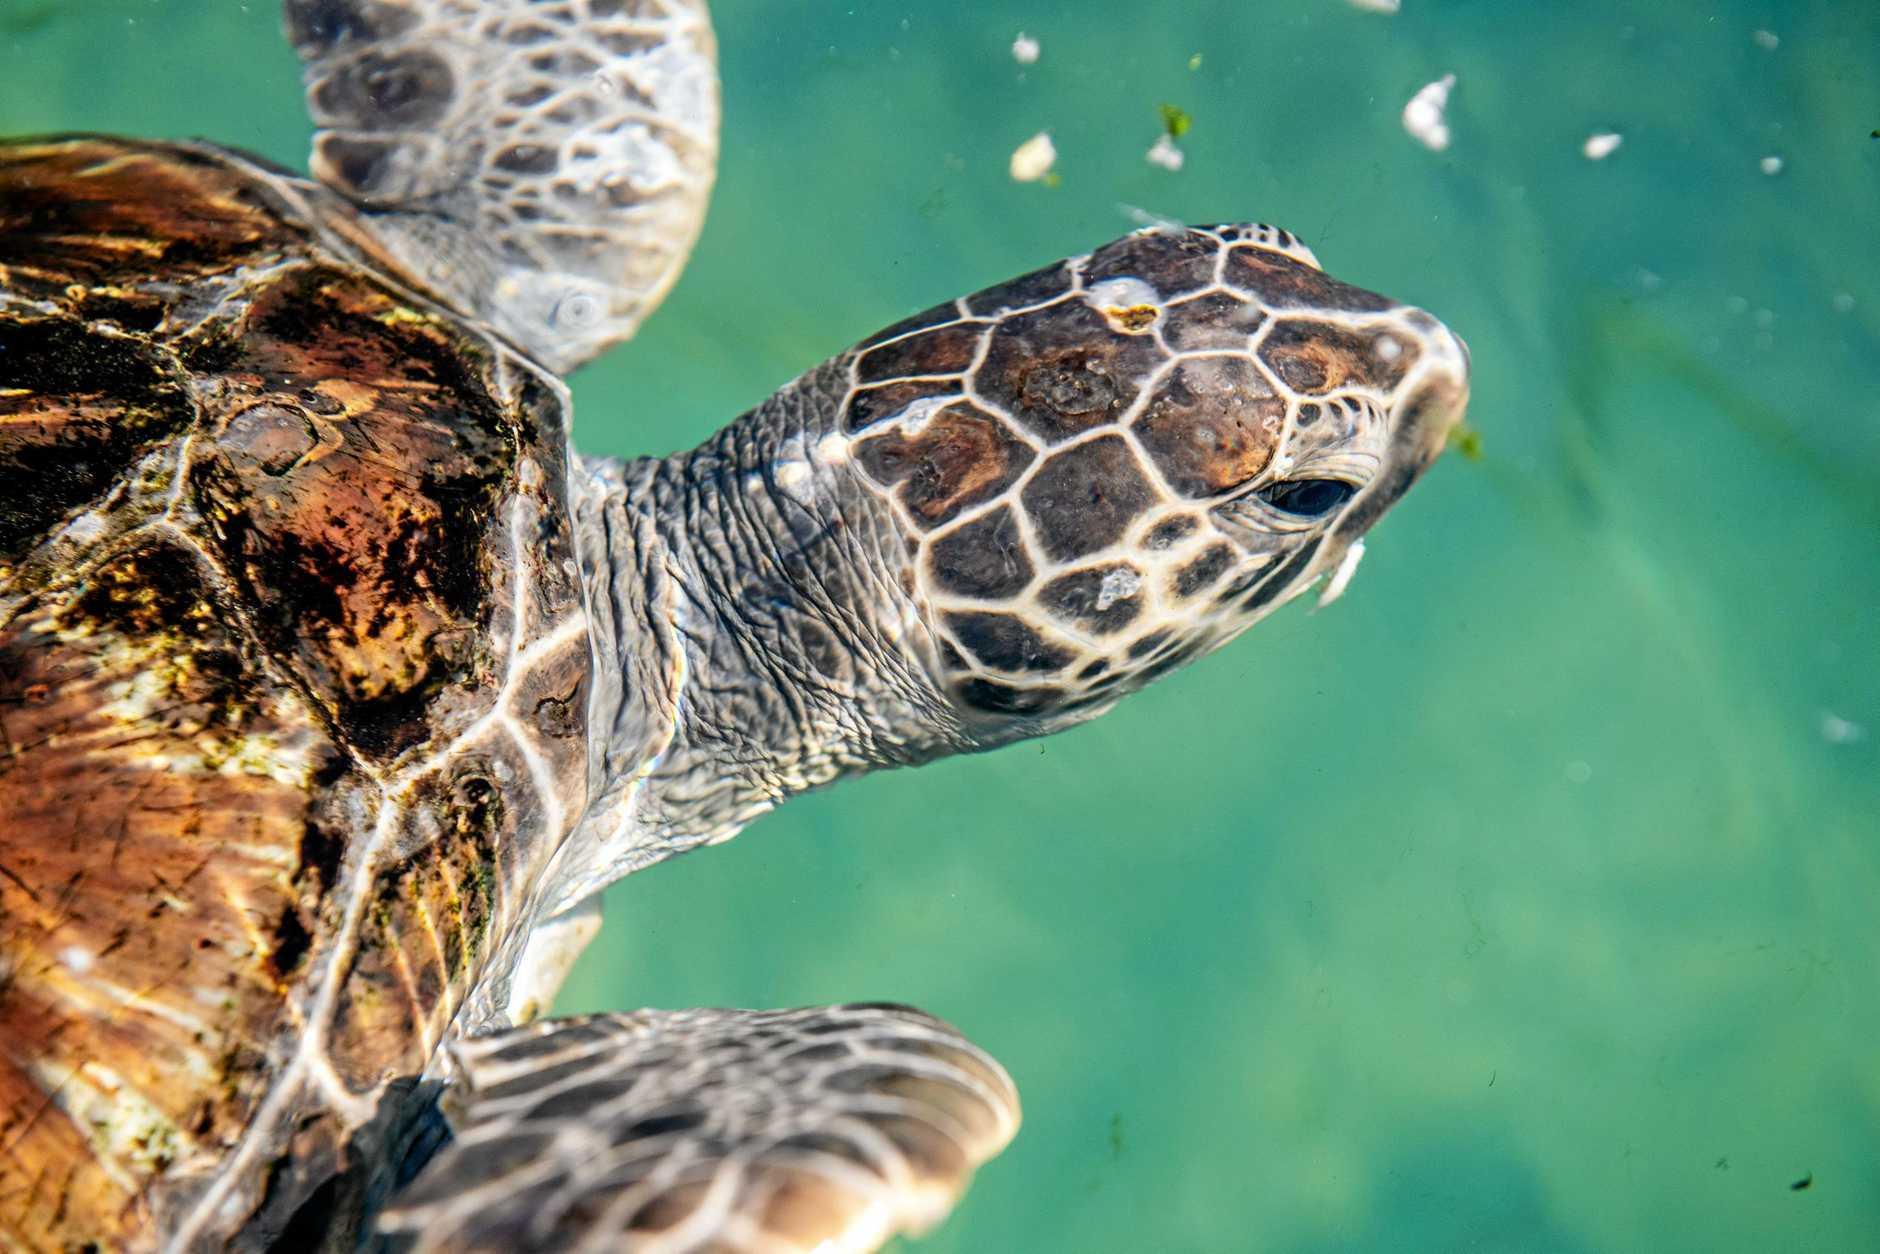 rehabilated Turtles at Dolphin Marine Conservation Park, . 22 MAY 2019